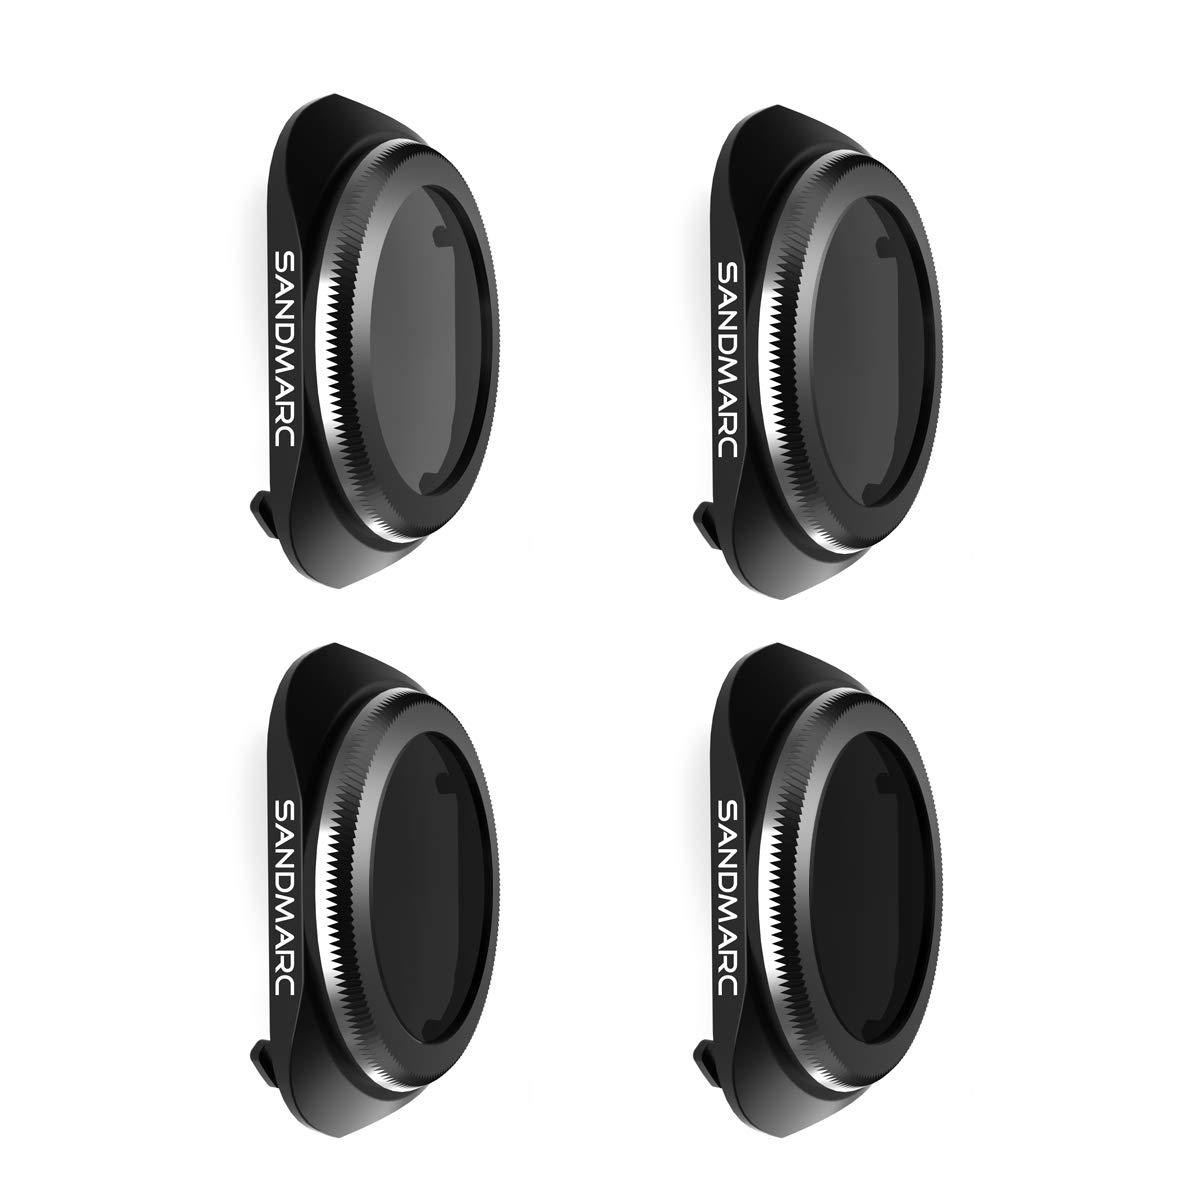 SANDMARC Pro Filters for DJI Mavic 2 Pro - ND4/PL, ND8/PL, ND16/PL, ND32/PL Filter Set (4-Pack) by SANDMARC (Image #1)